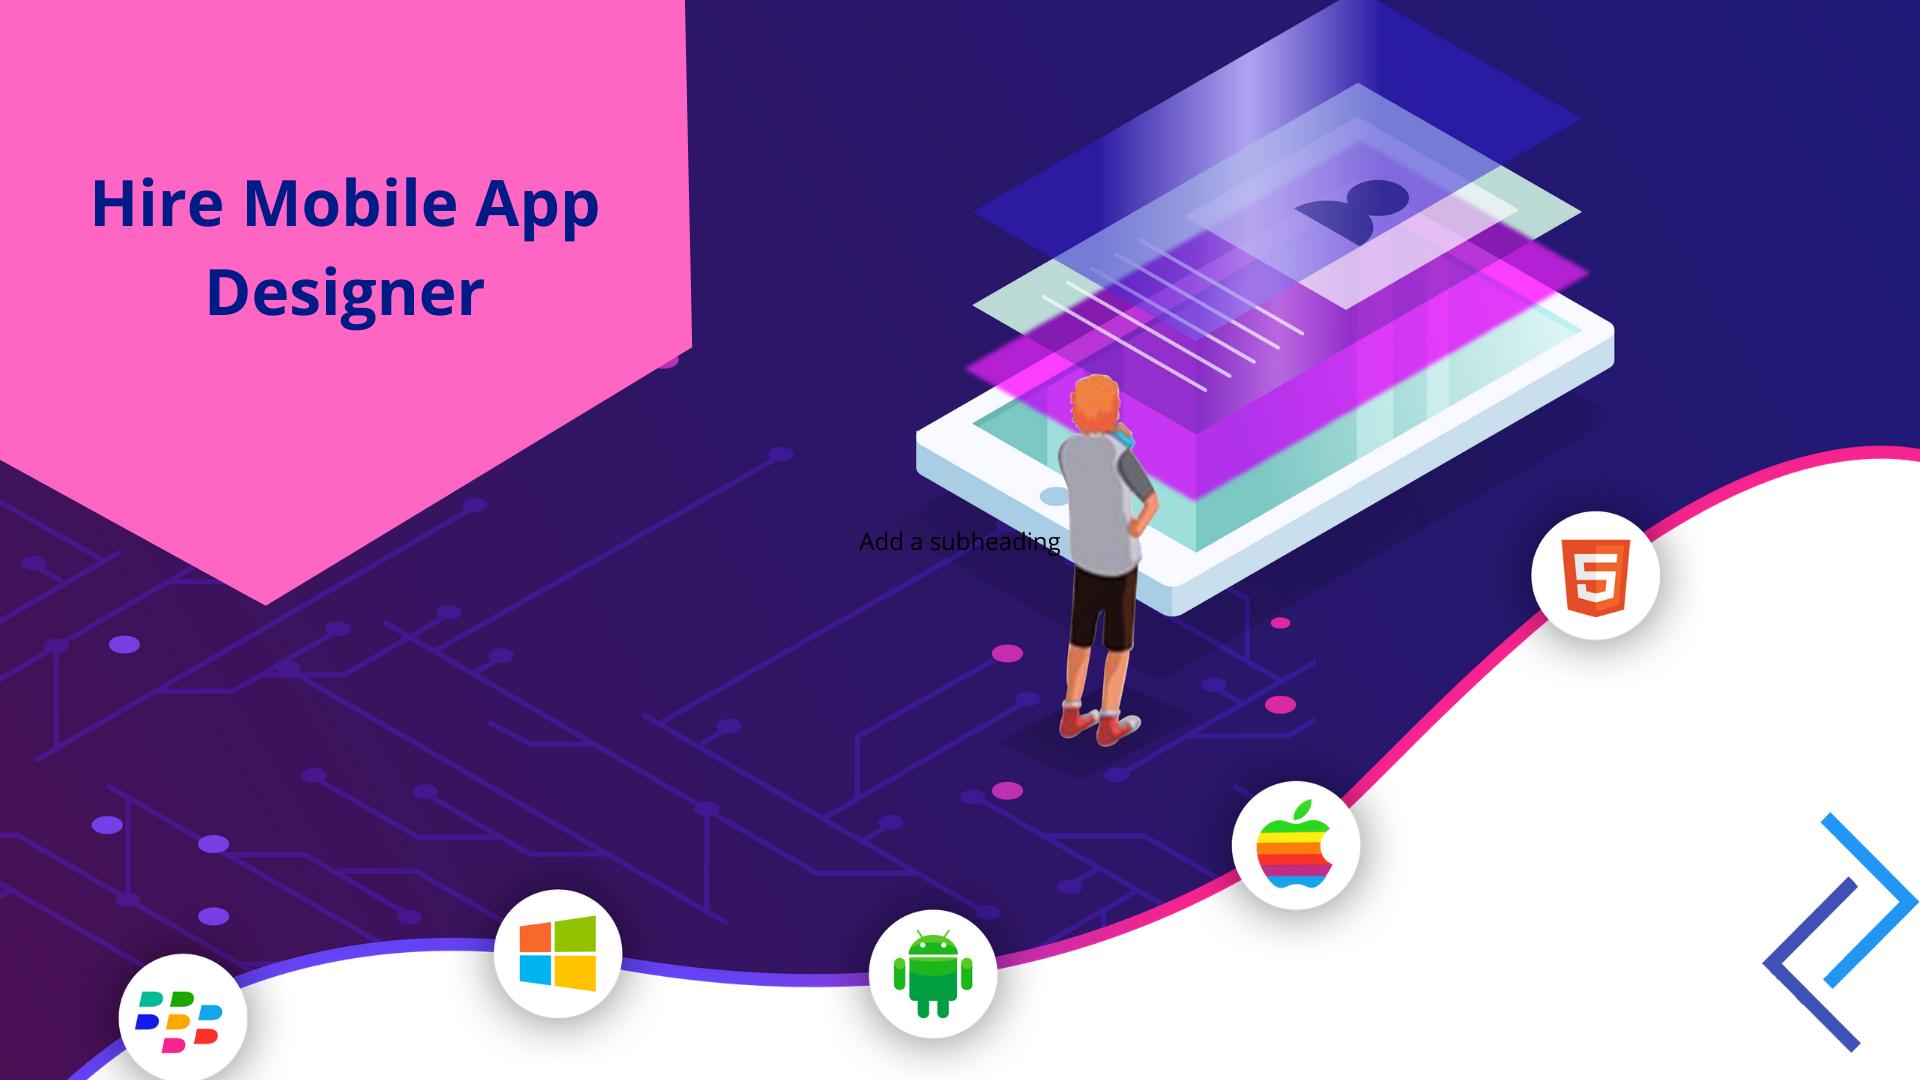 Hire Mobile App Designer